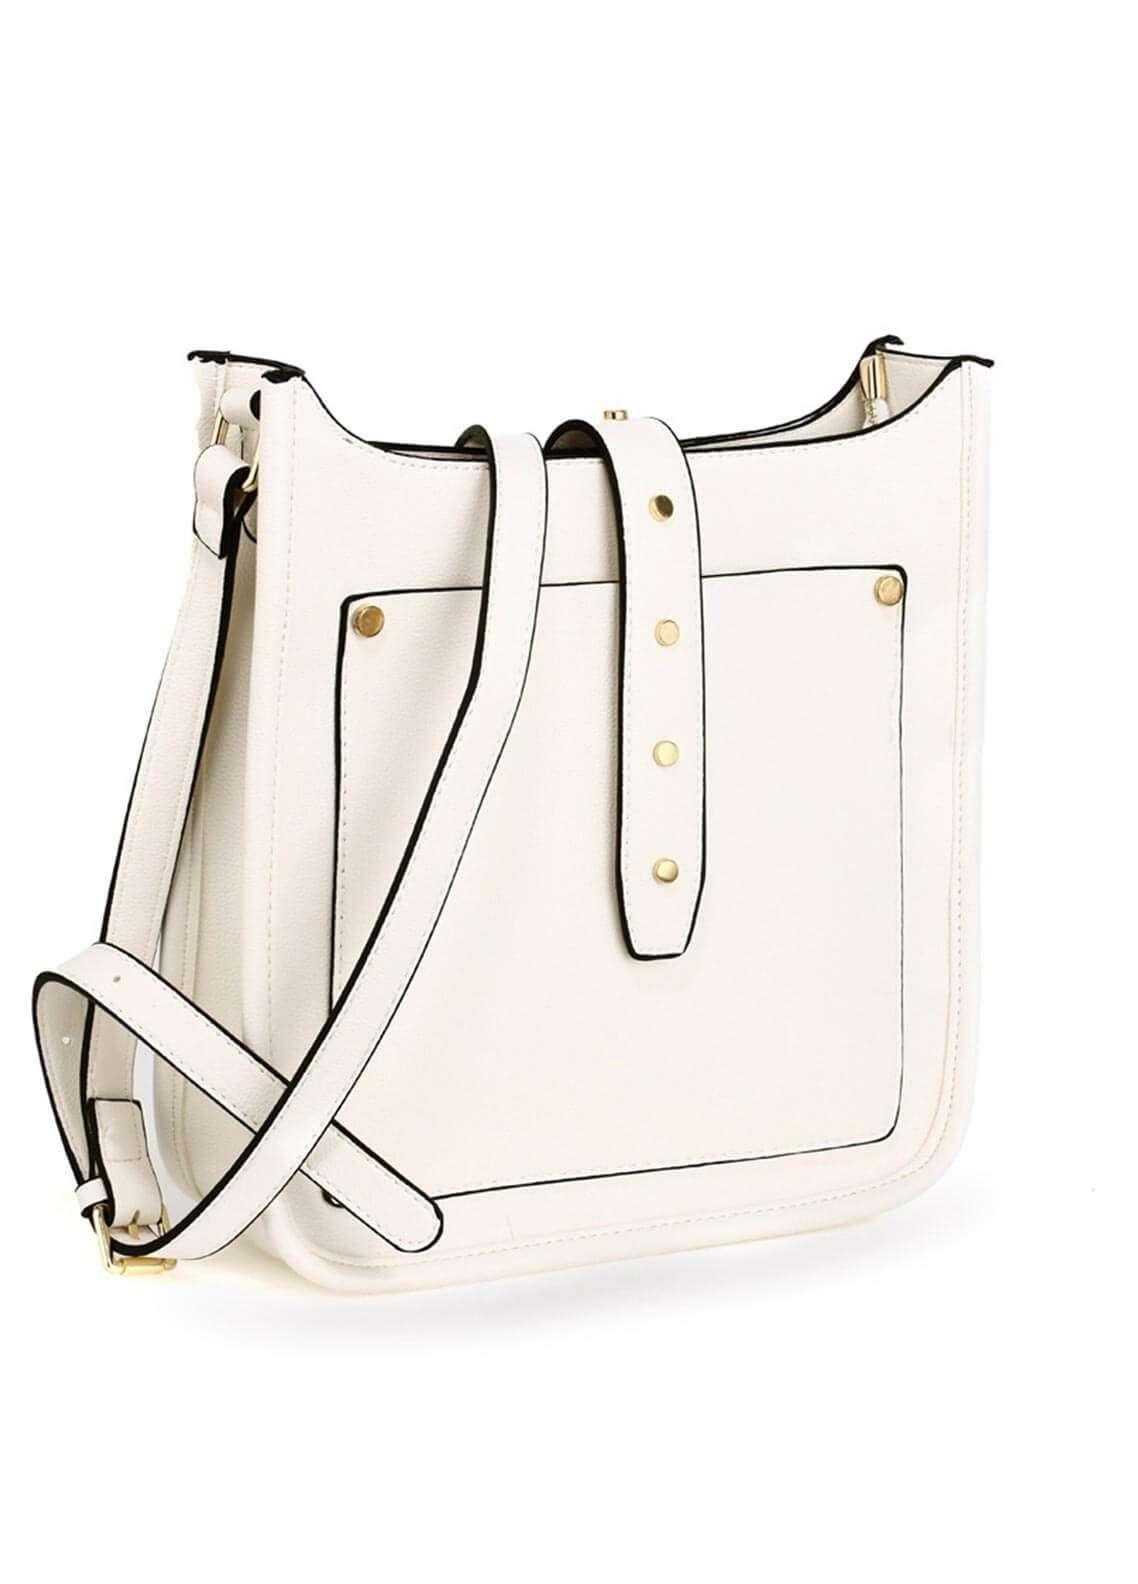 Anna Grace London Faux Leather Shoulder  Bags for Woman - White